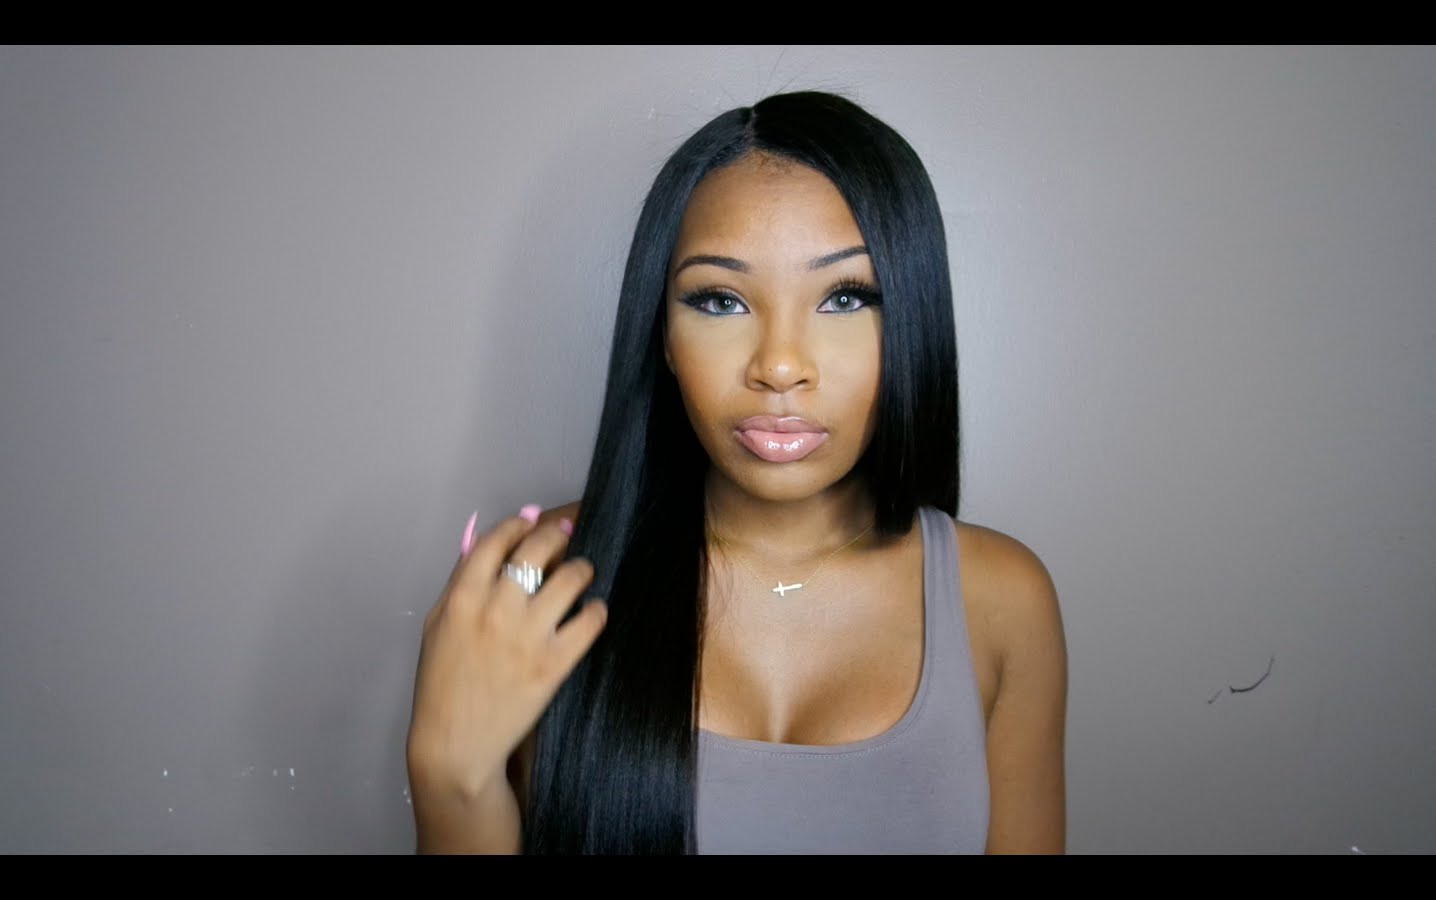 Kinky straight wig review by MsAaliyahJay